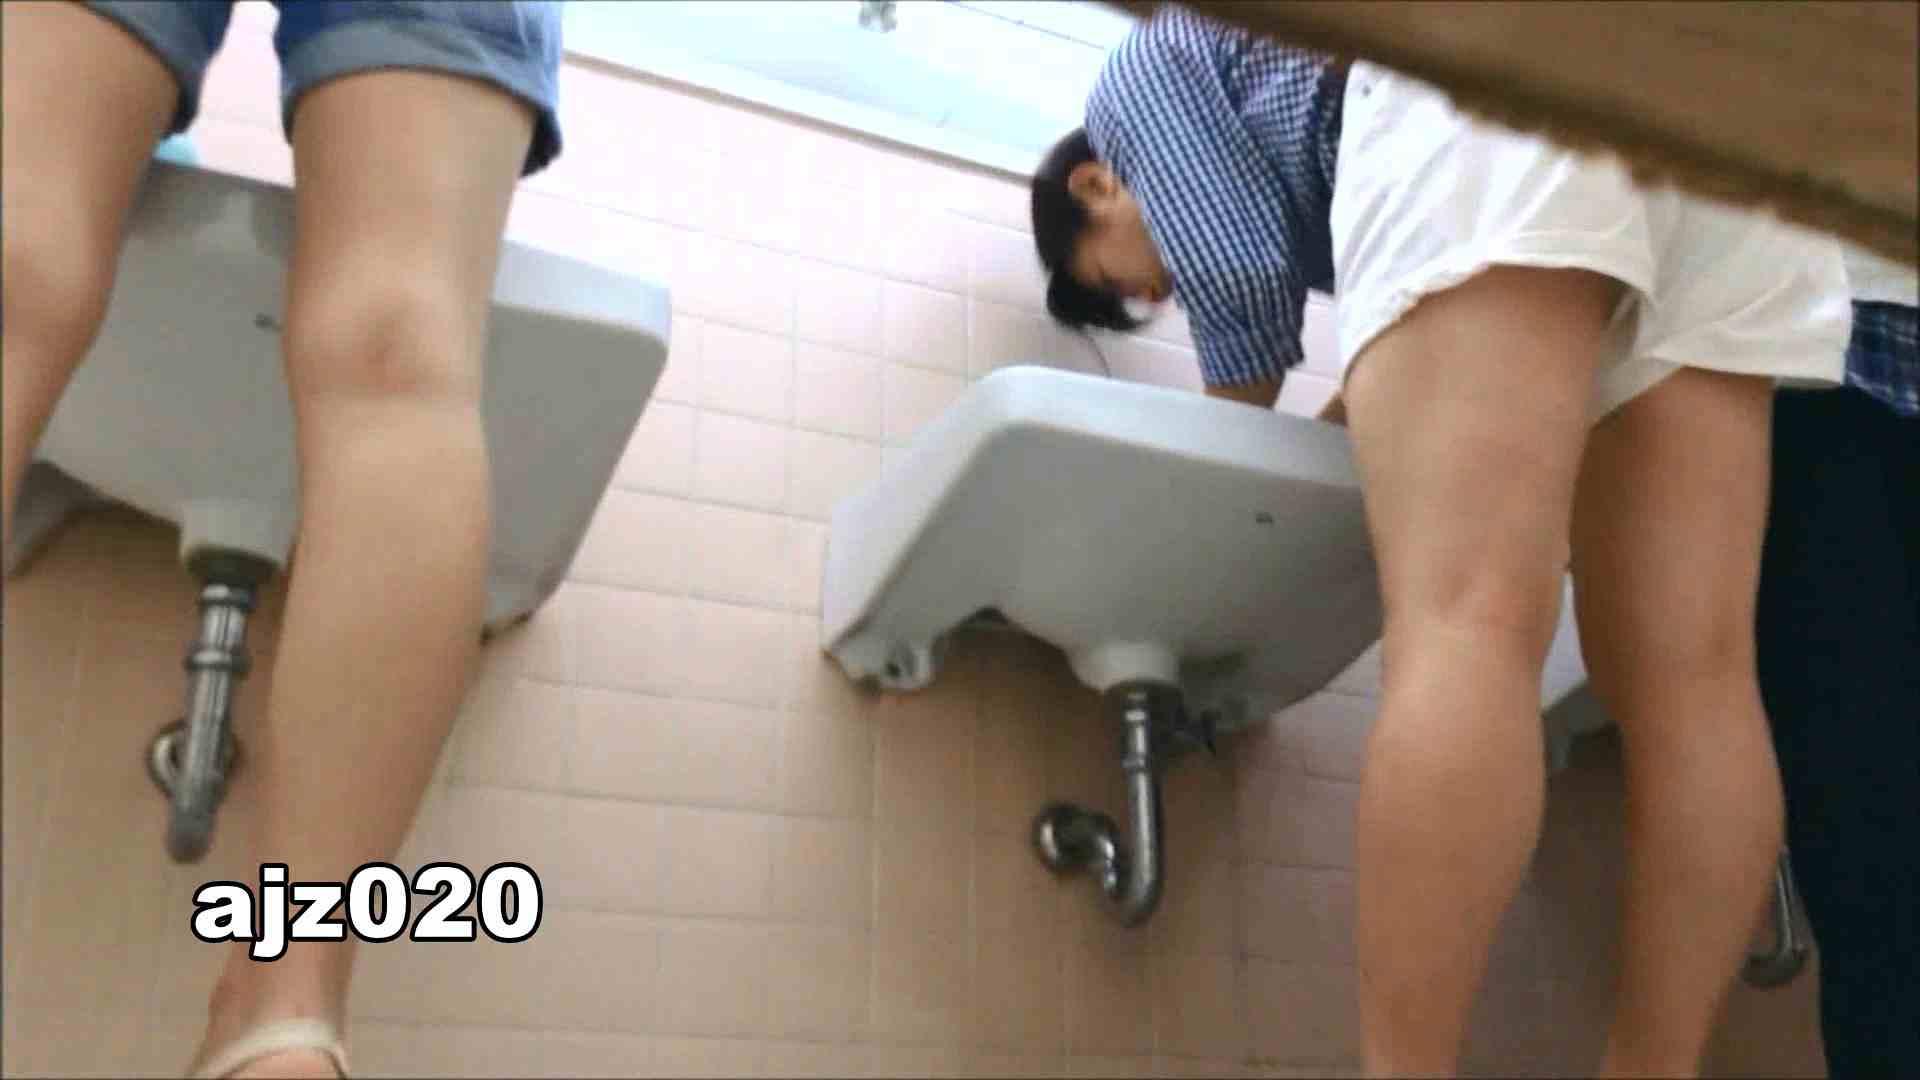 某有名大学女性洗面所 vol.20 洗面所突入 | 美しいOLの裸体  79pic 61